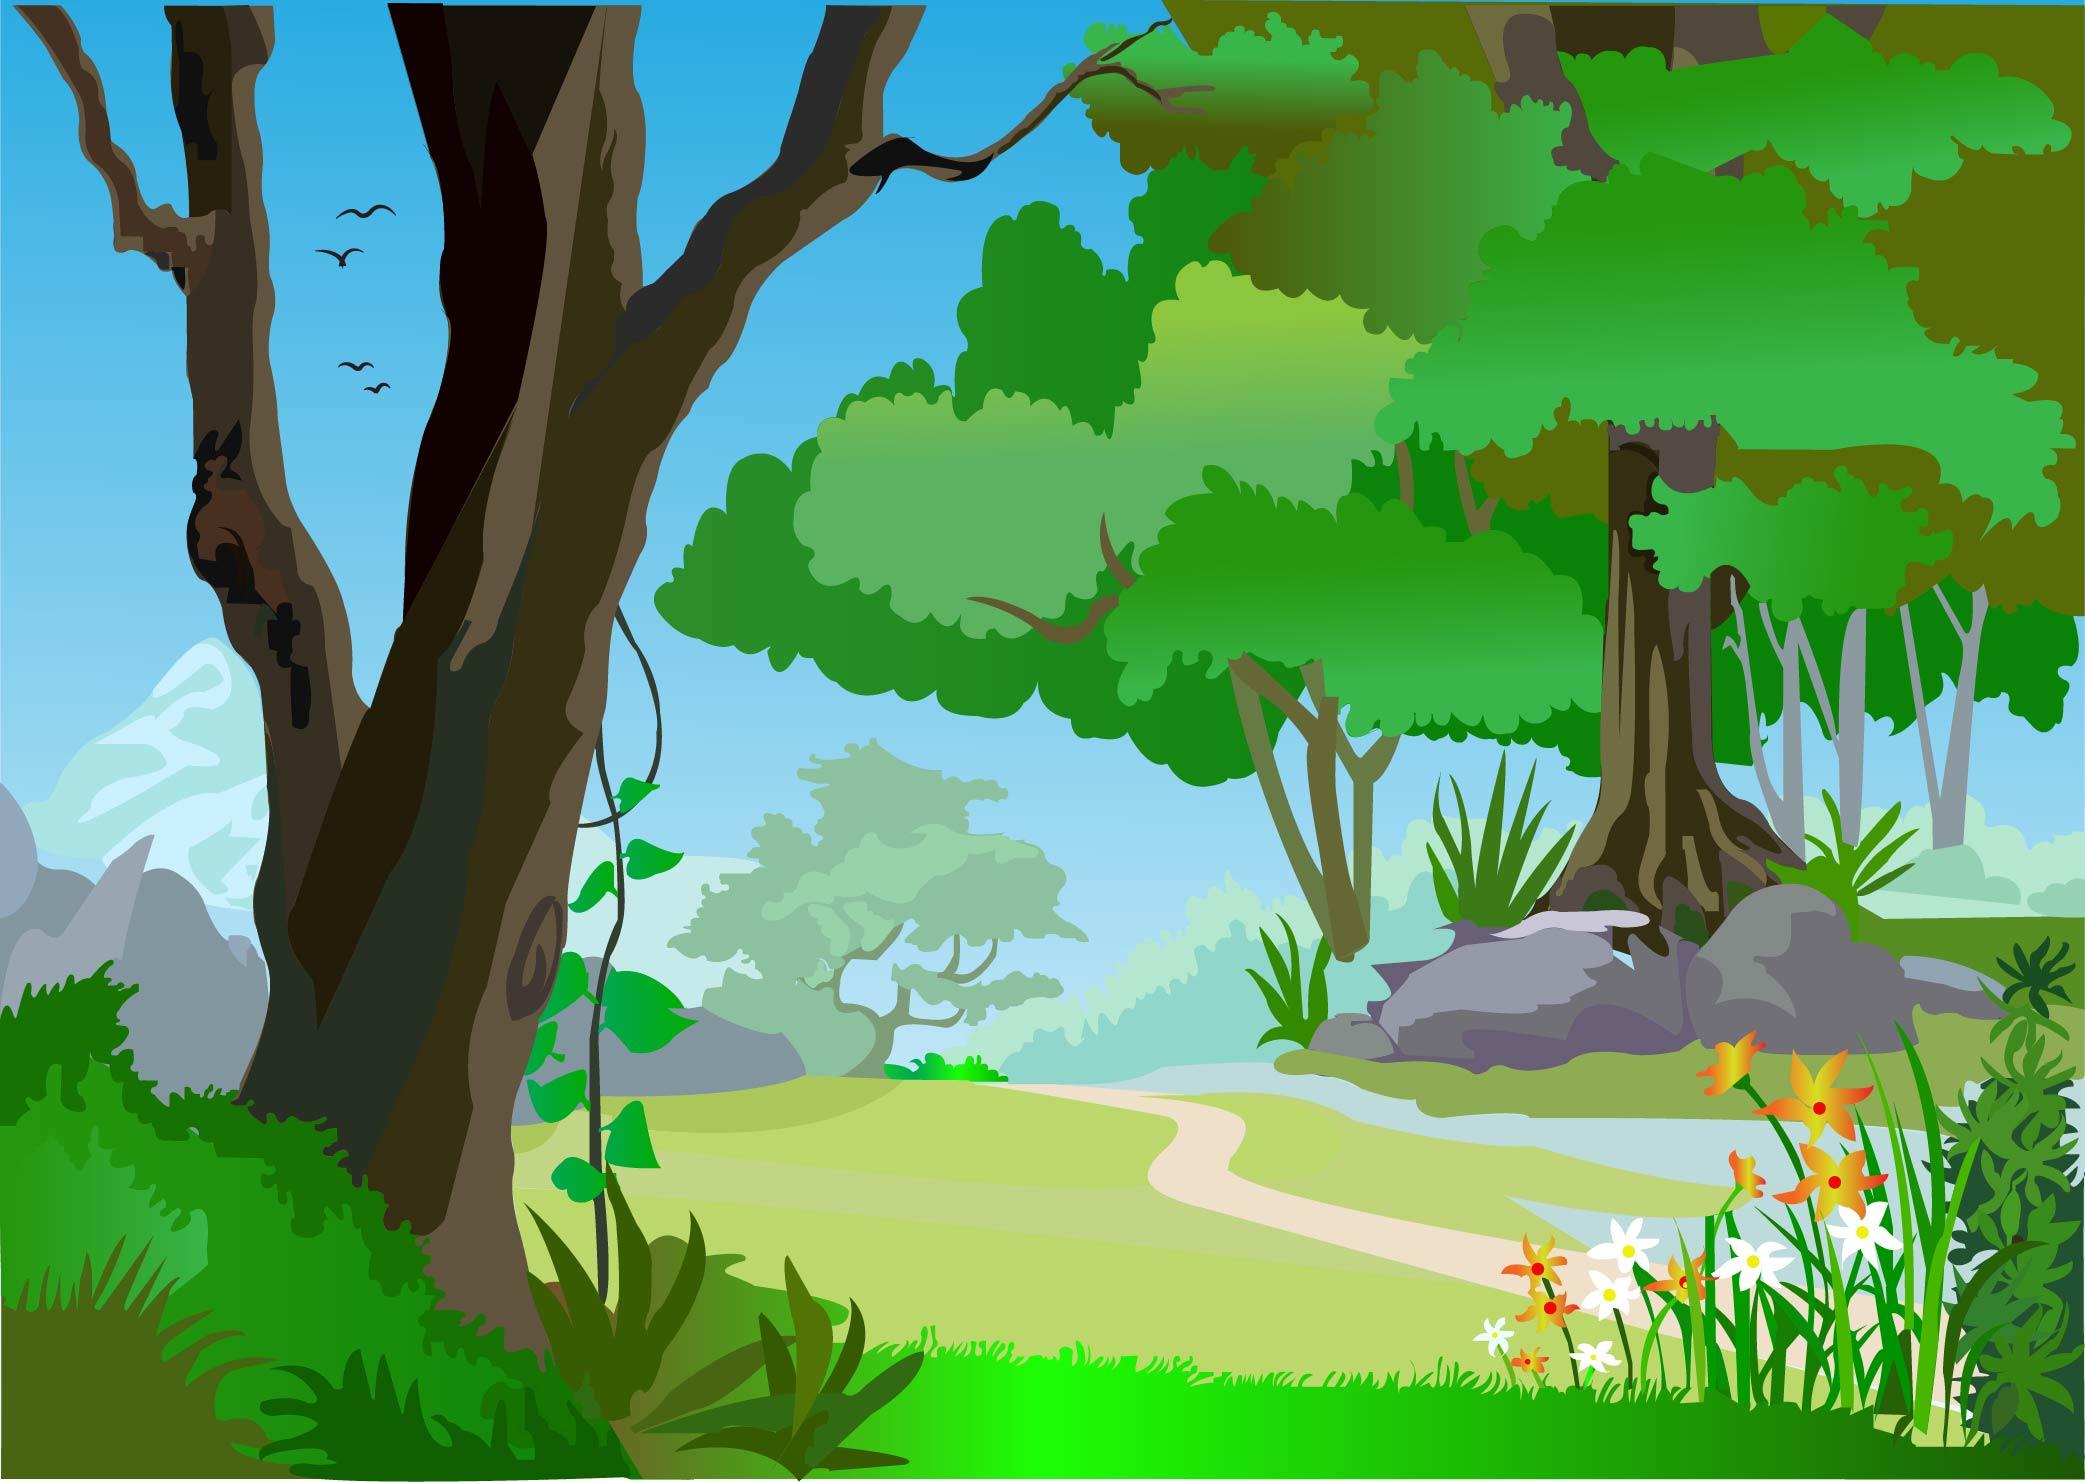 Green forest landscape with Adobe Illustrator